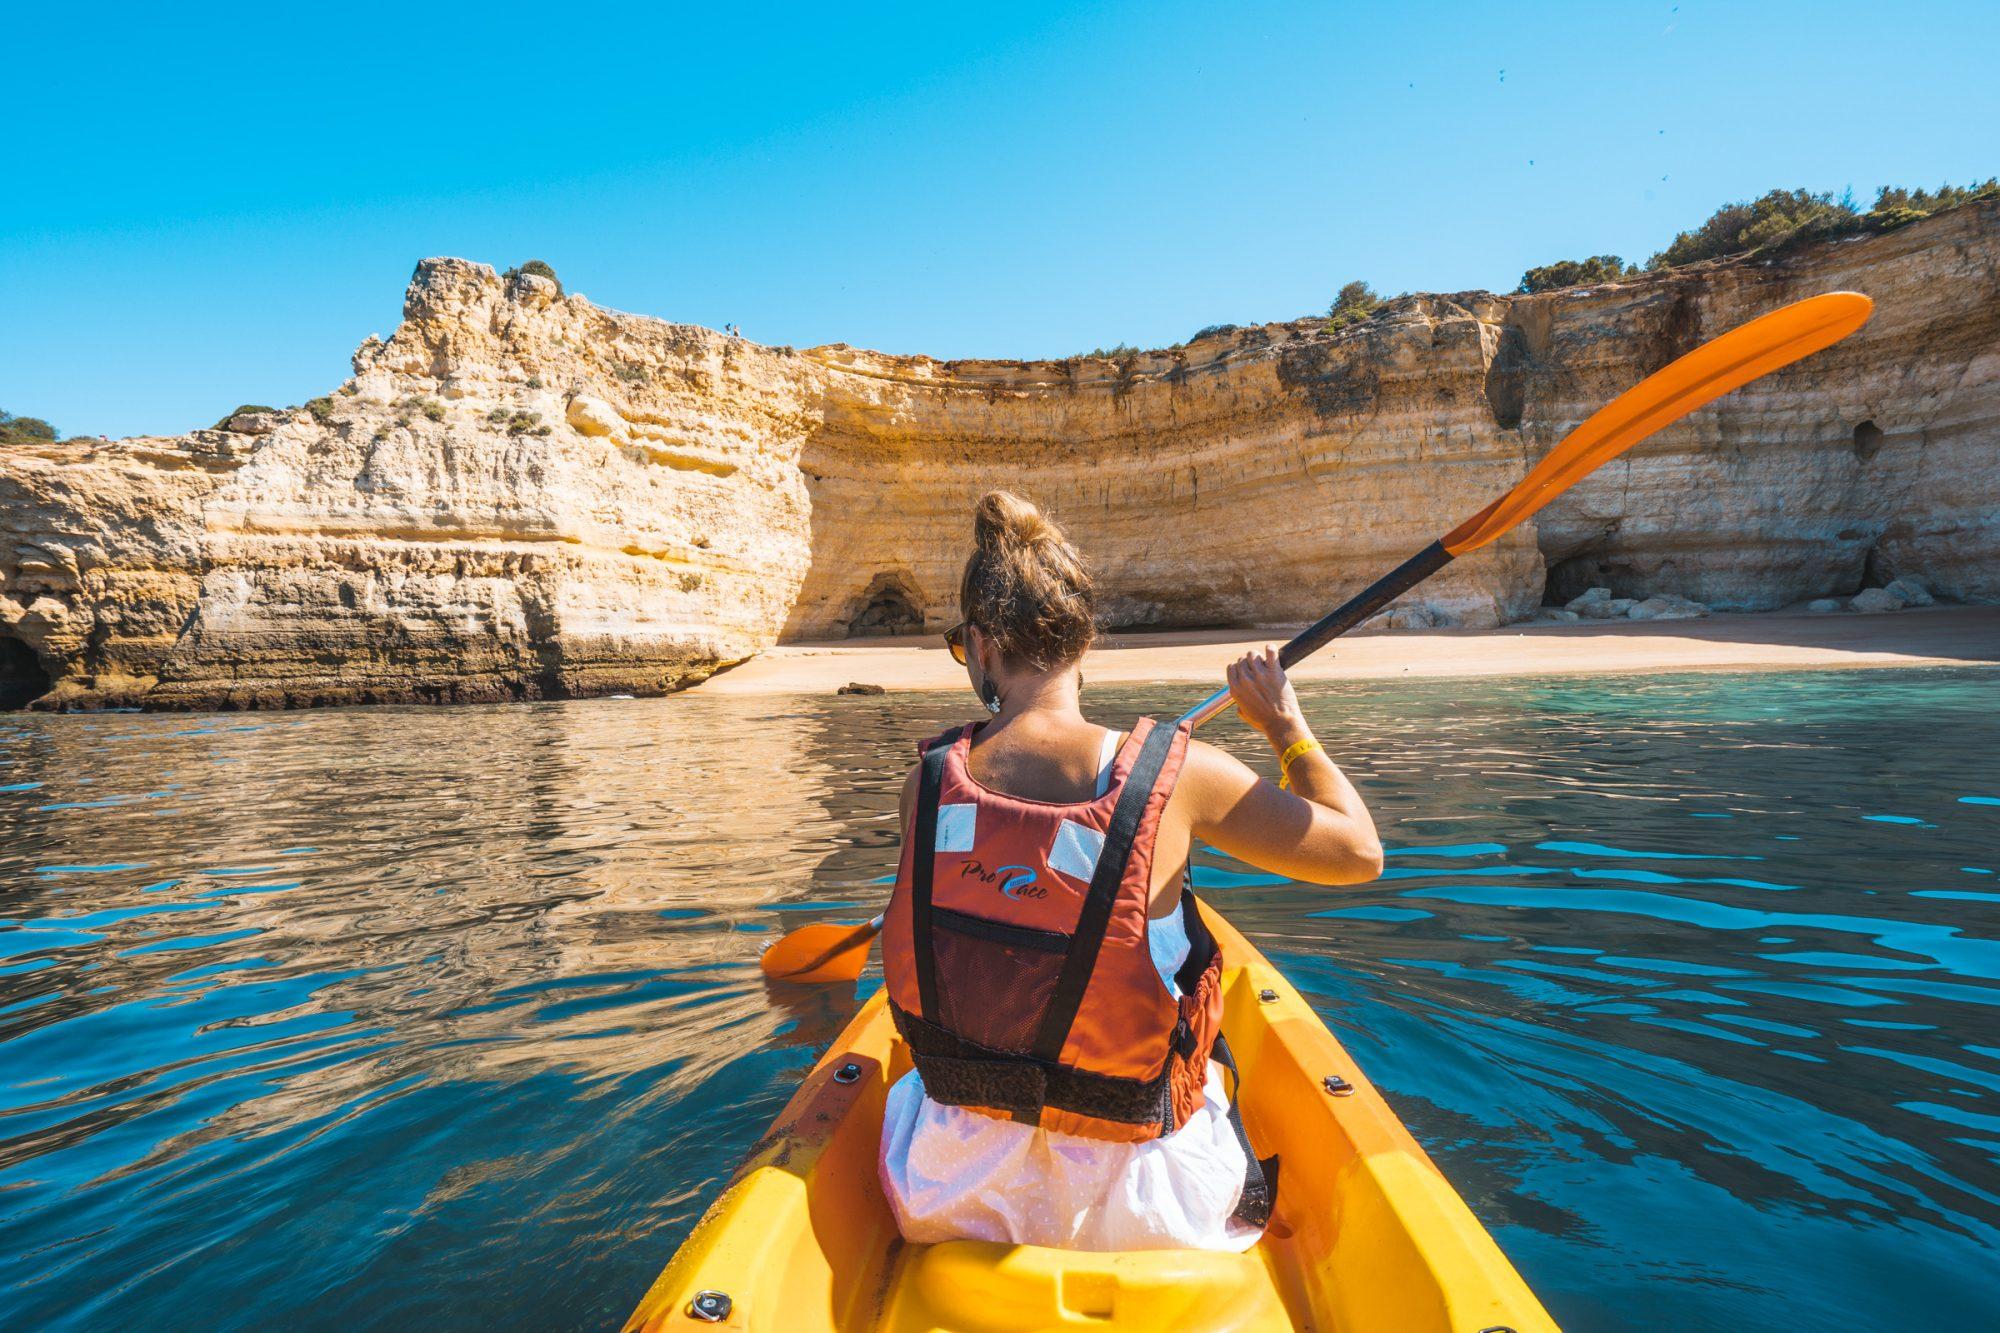 Bengali Höhle Portugal, Algarve Tipps, Sehenswürdigkeiten